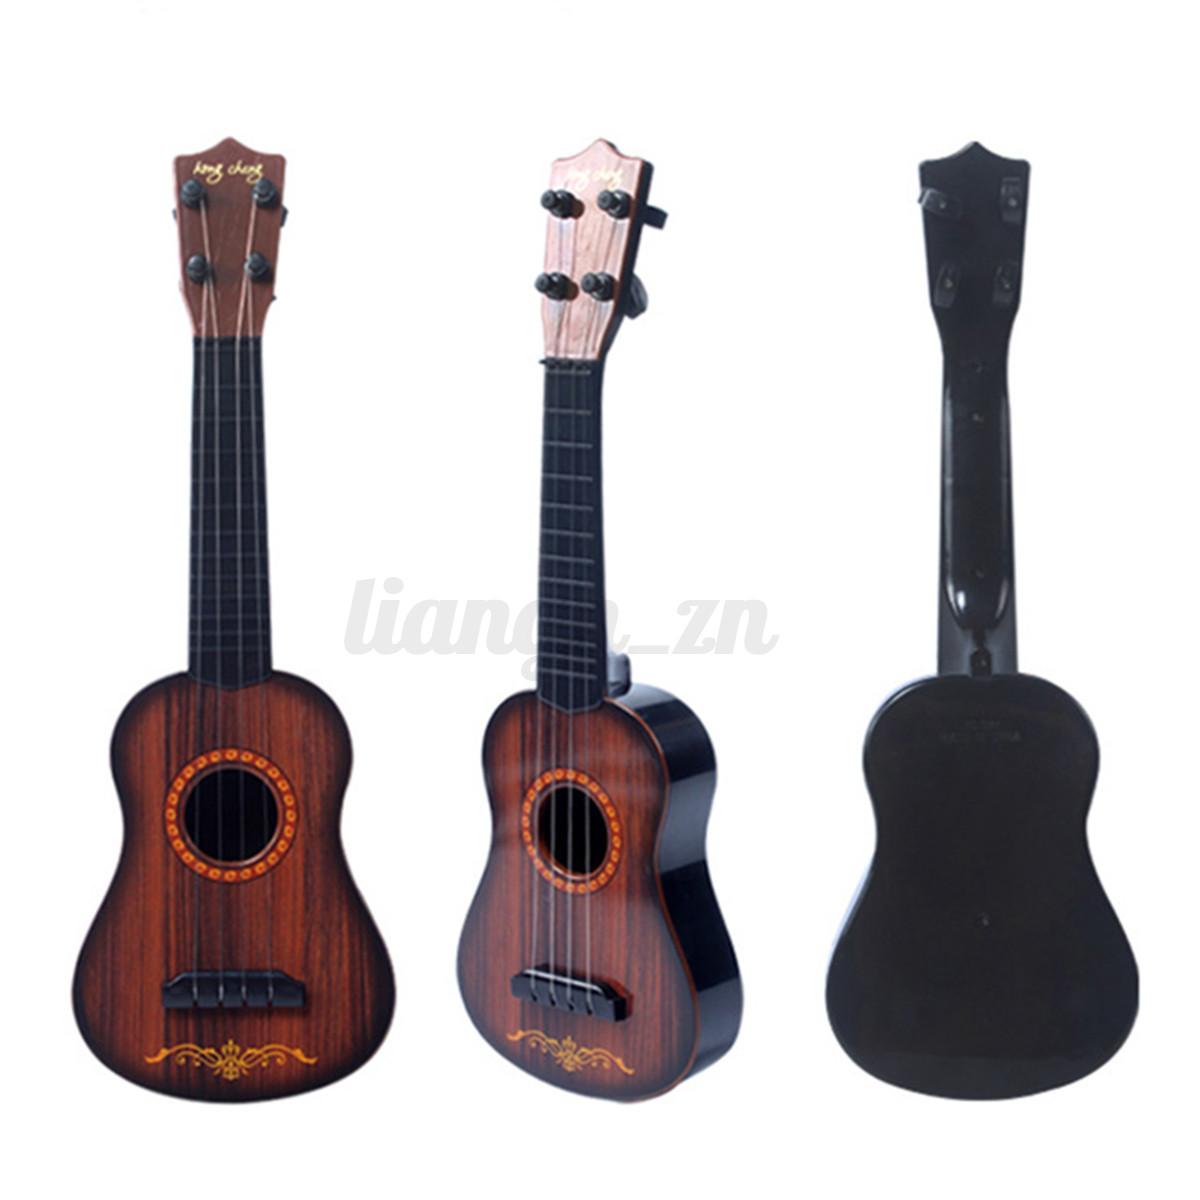 Ukulele-Mini-Gitarre-Guitar-17-inch-Acoustic-akustische-Spielzeug-Anfaenger